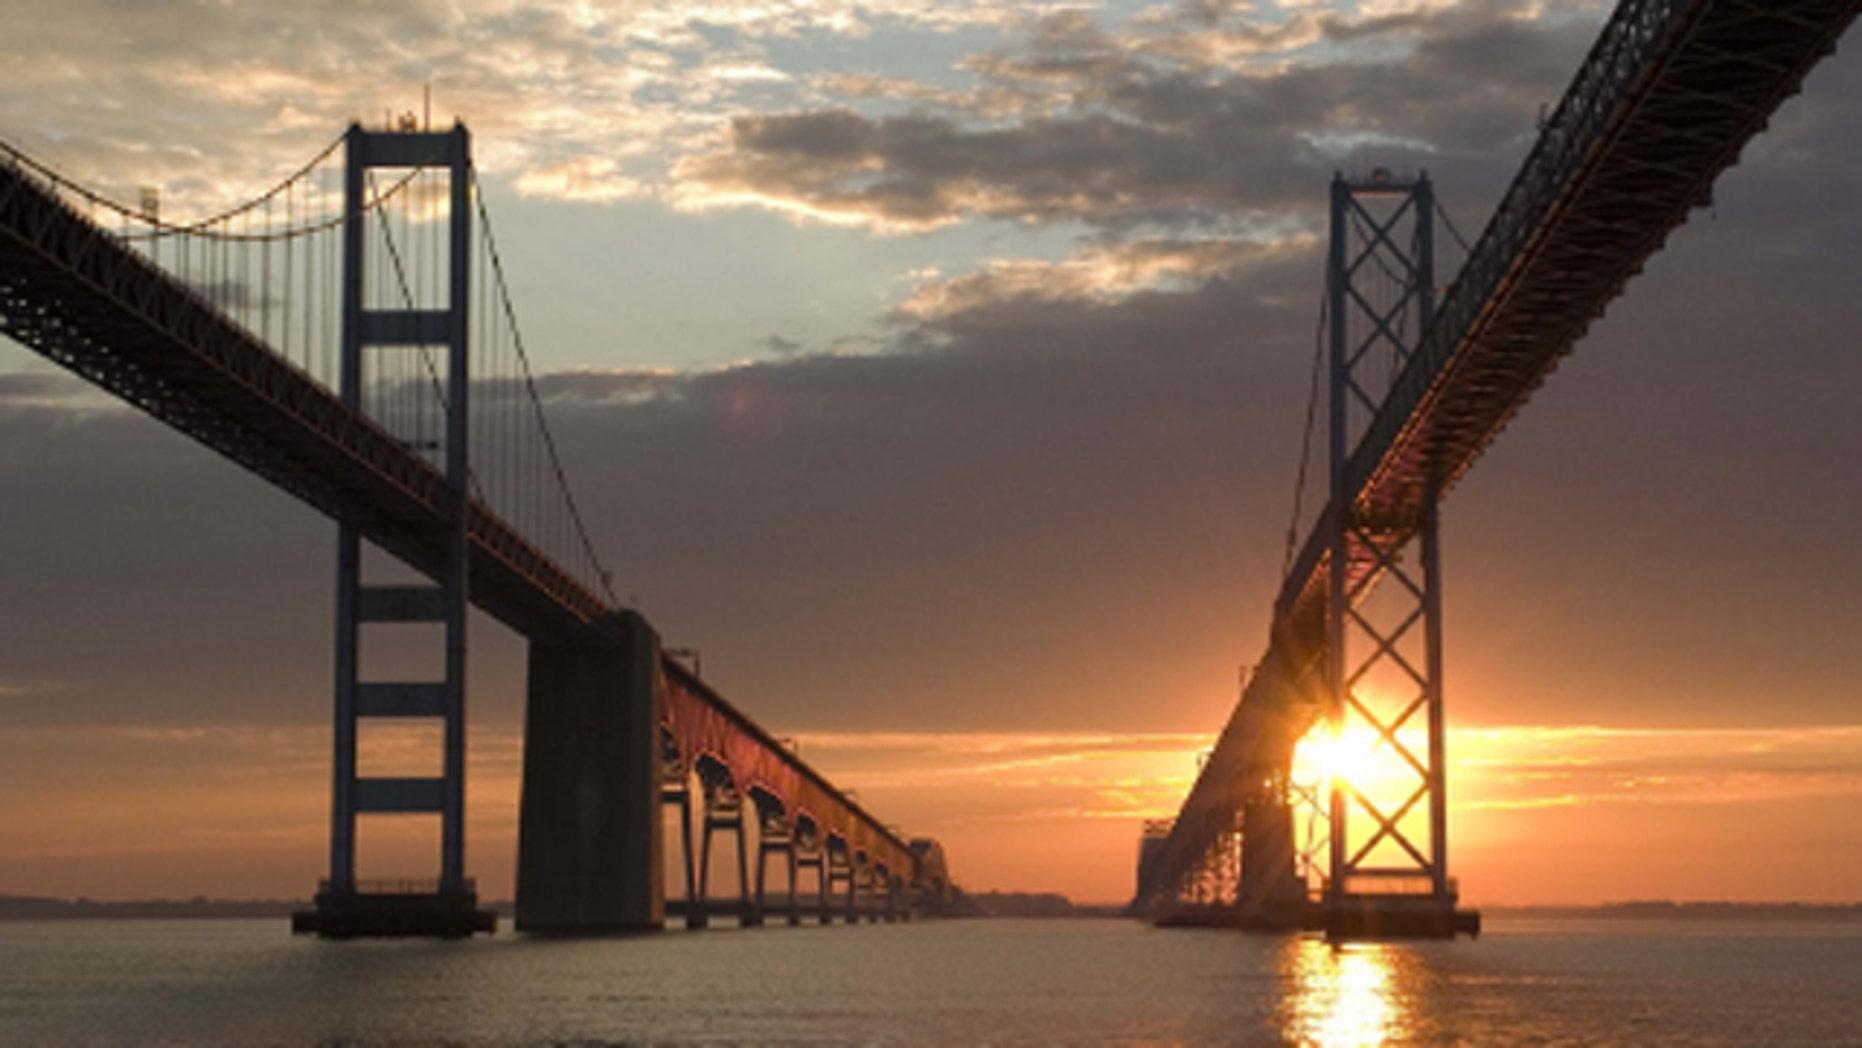 Shown here is the Chesapeake Bay Bridge.